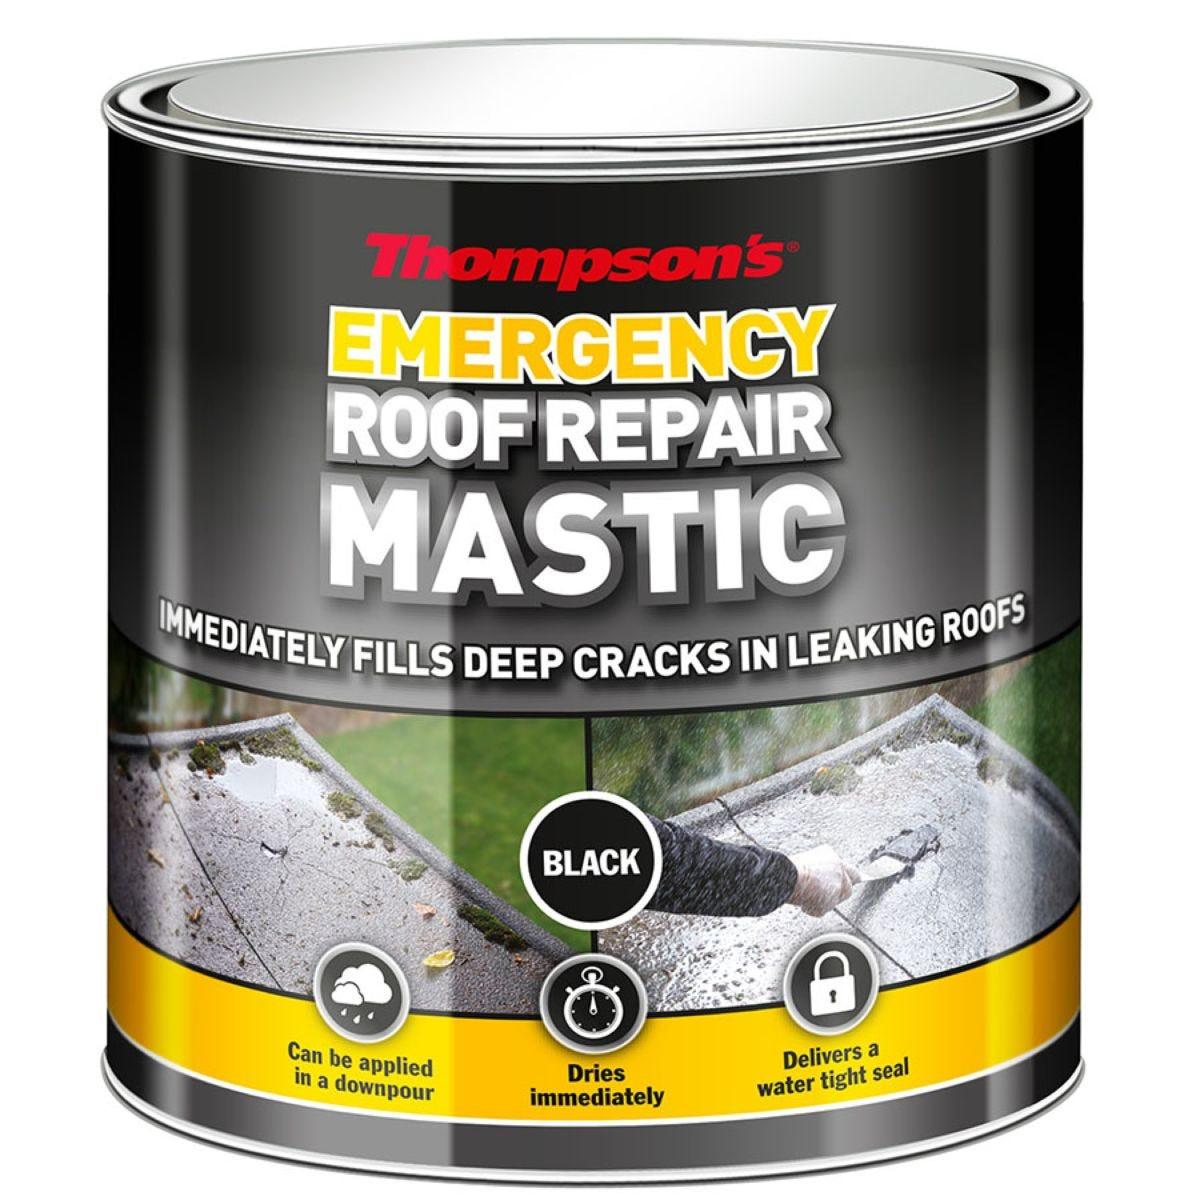 Thompson's Emergency Roof Repair Mastic Black 750ml